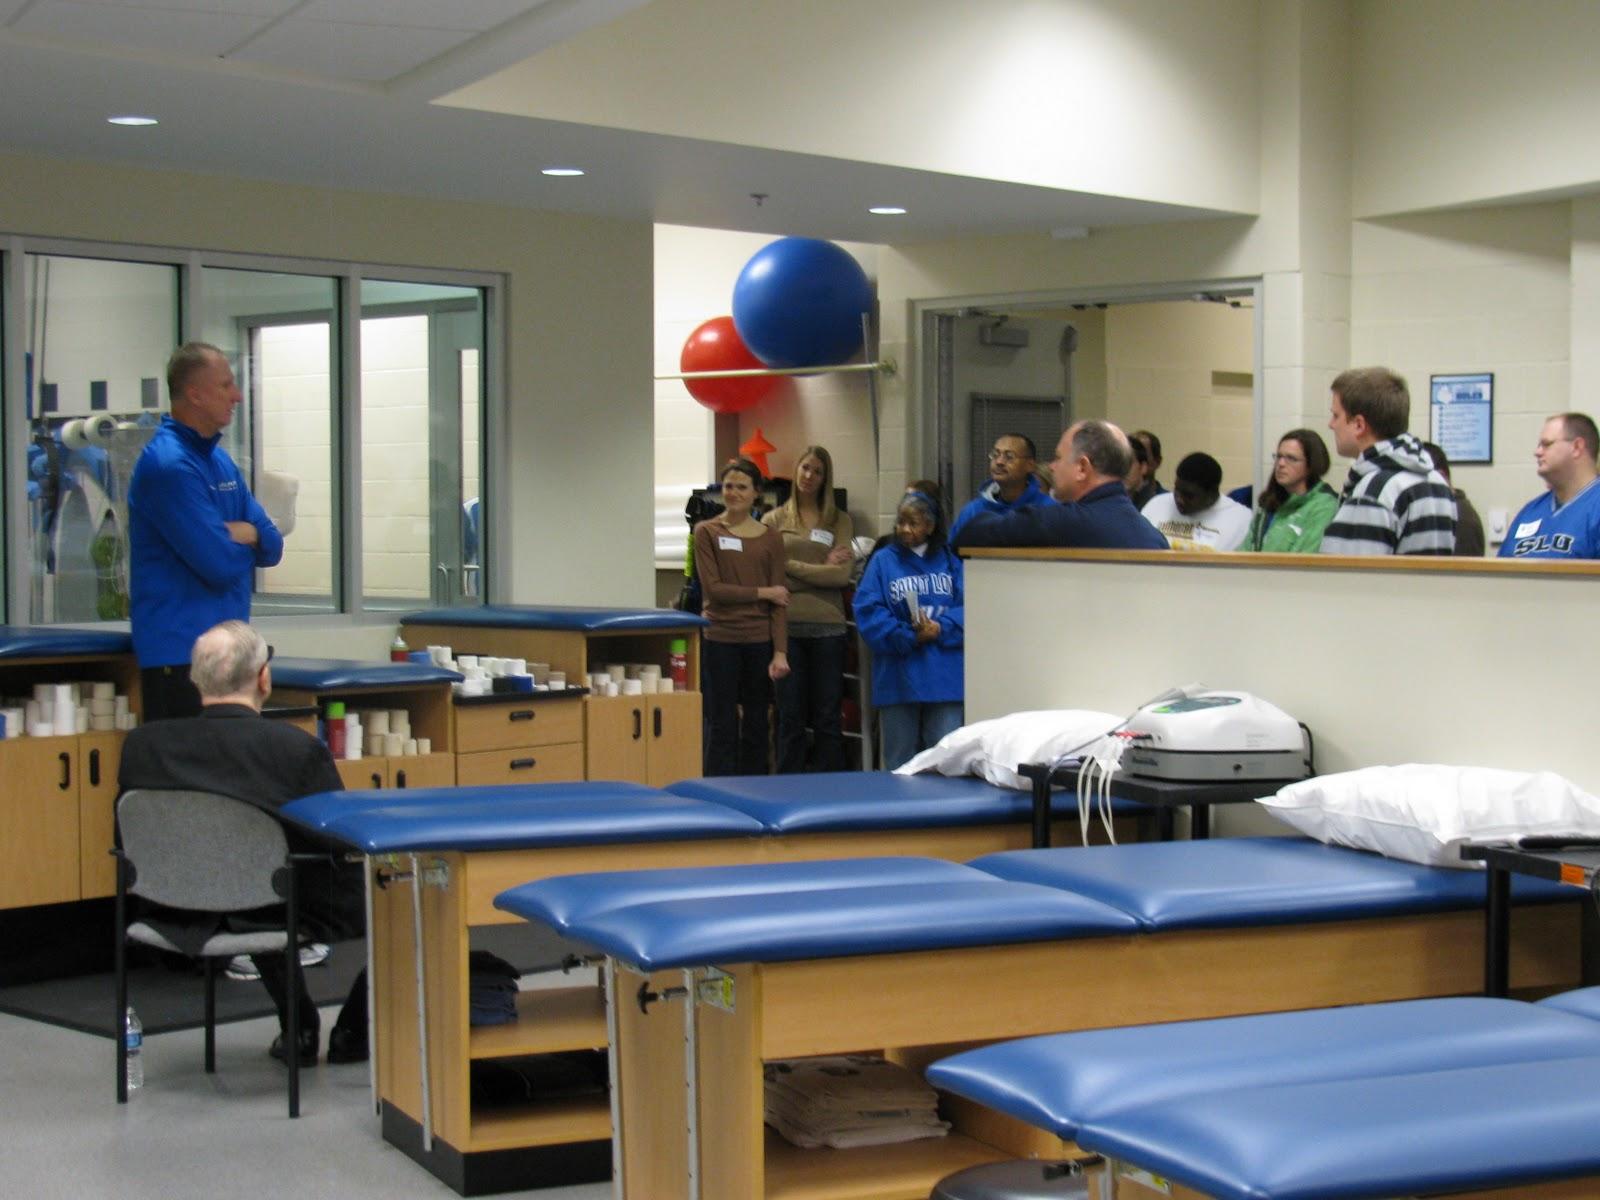 Saint Louis University Athletic Training Program January 2011